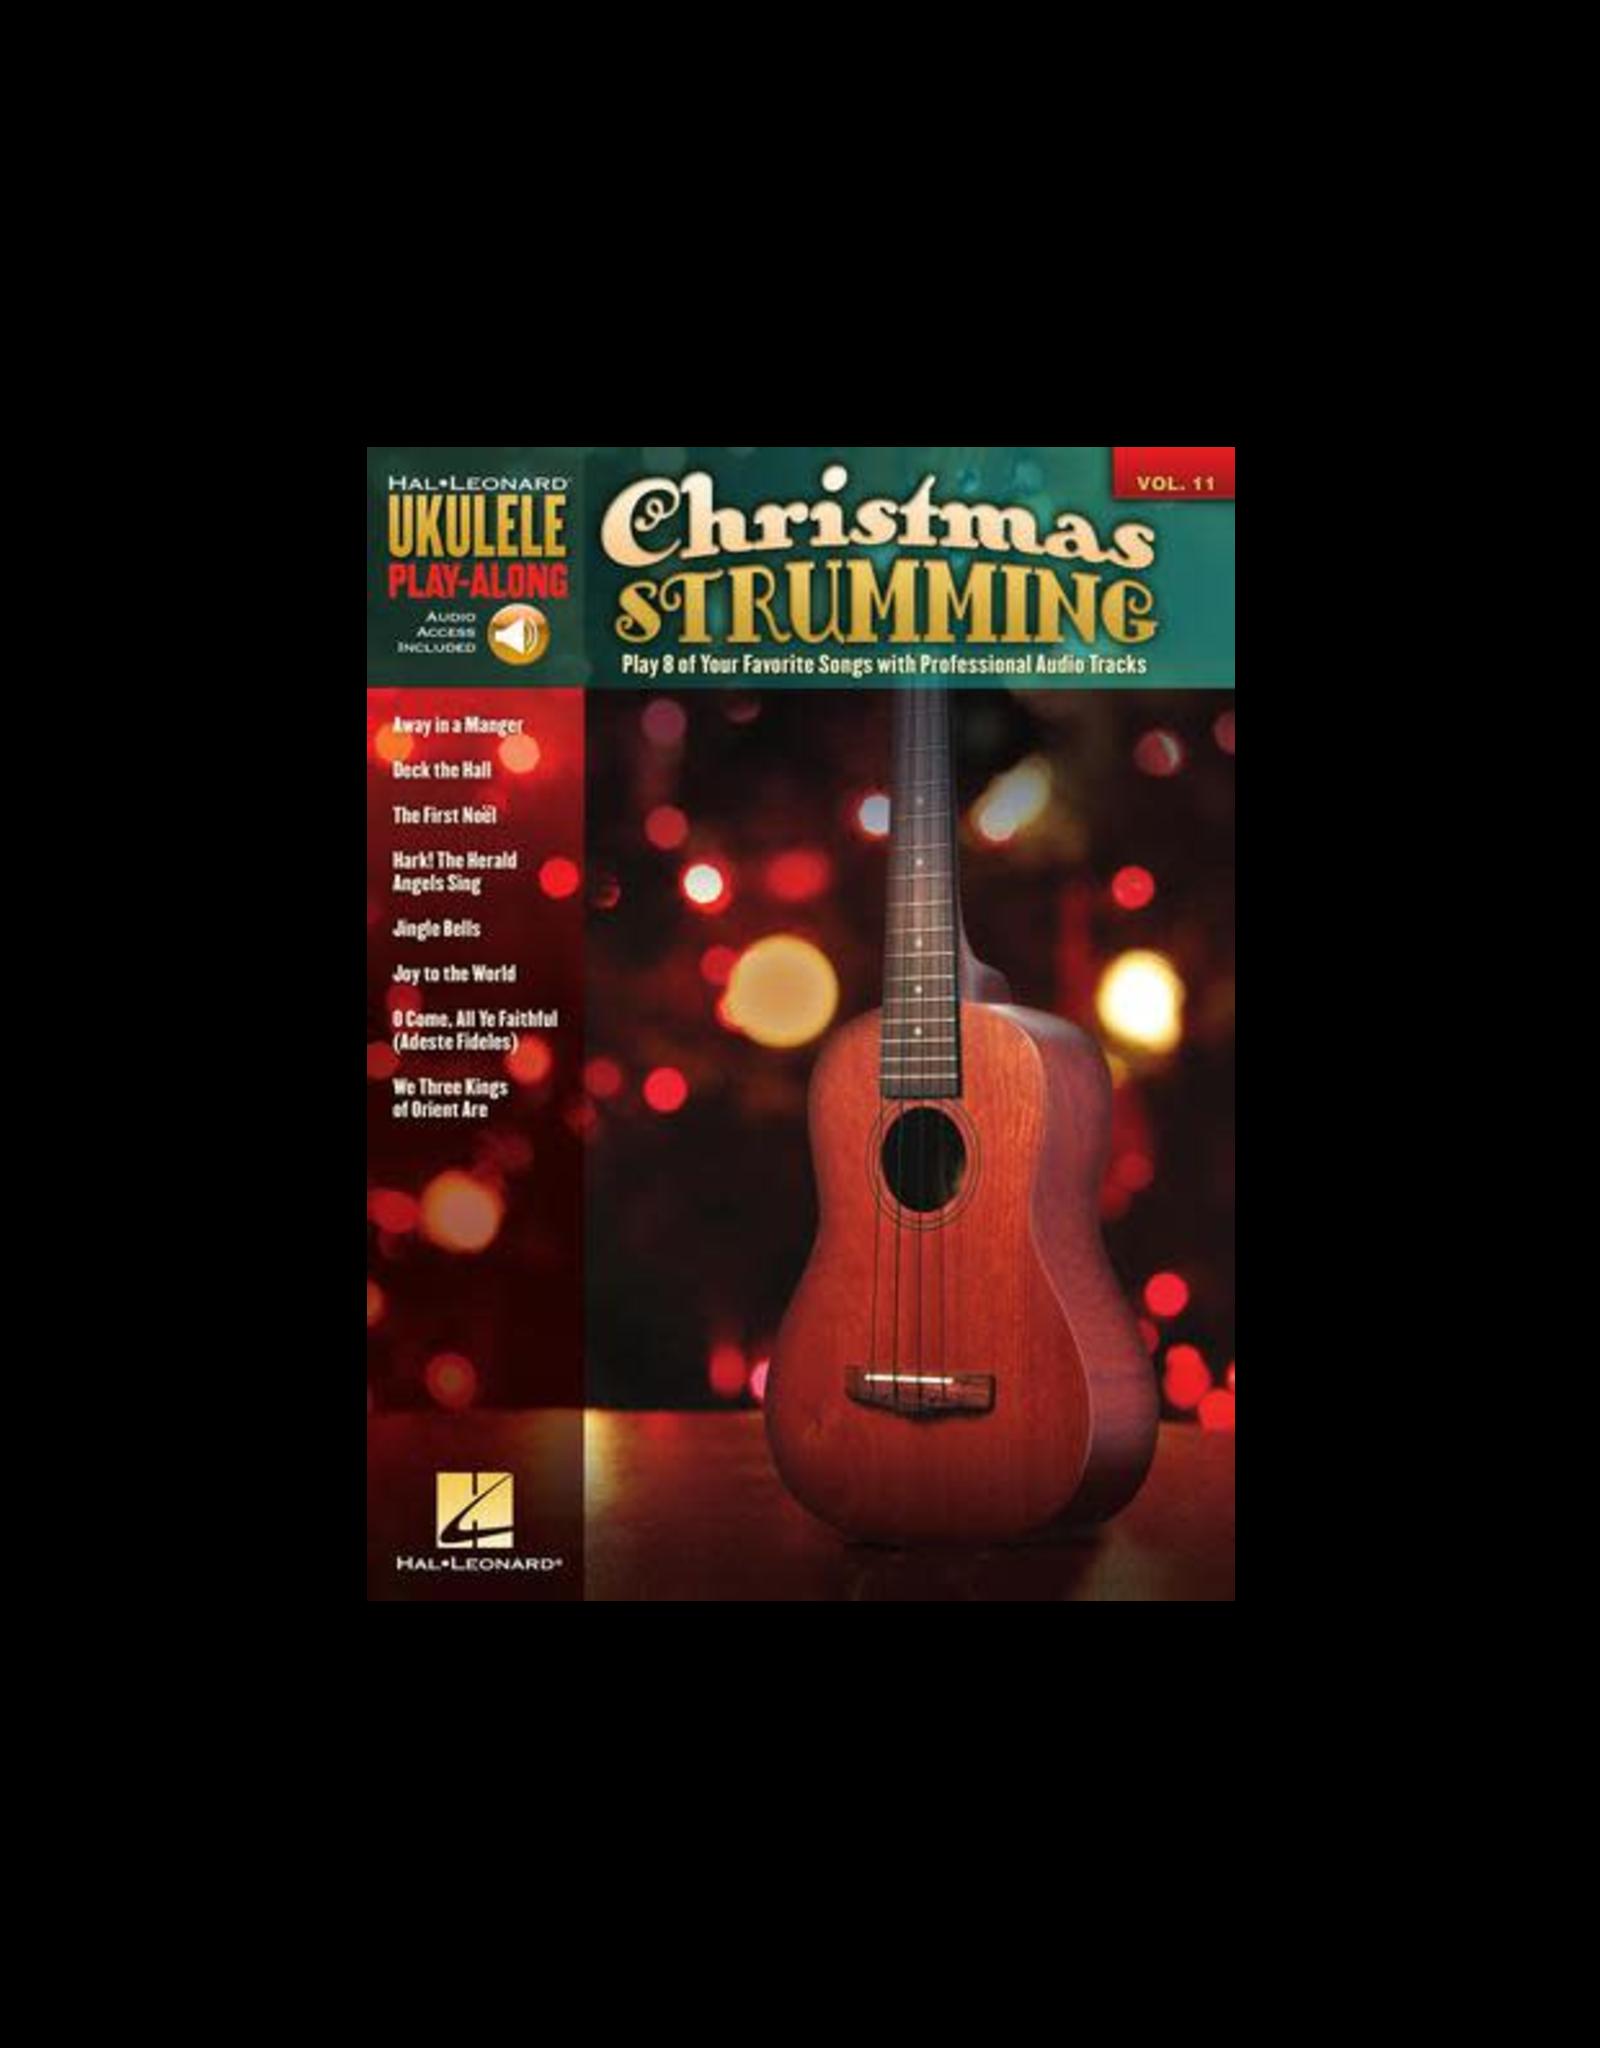 Hal Leonard Christmas Strumming Ukulele Play-Along Volume 11